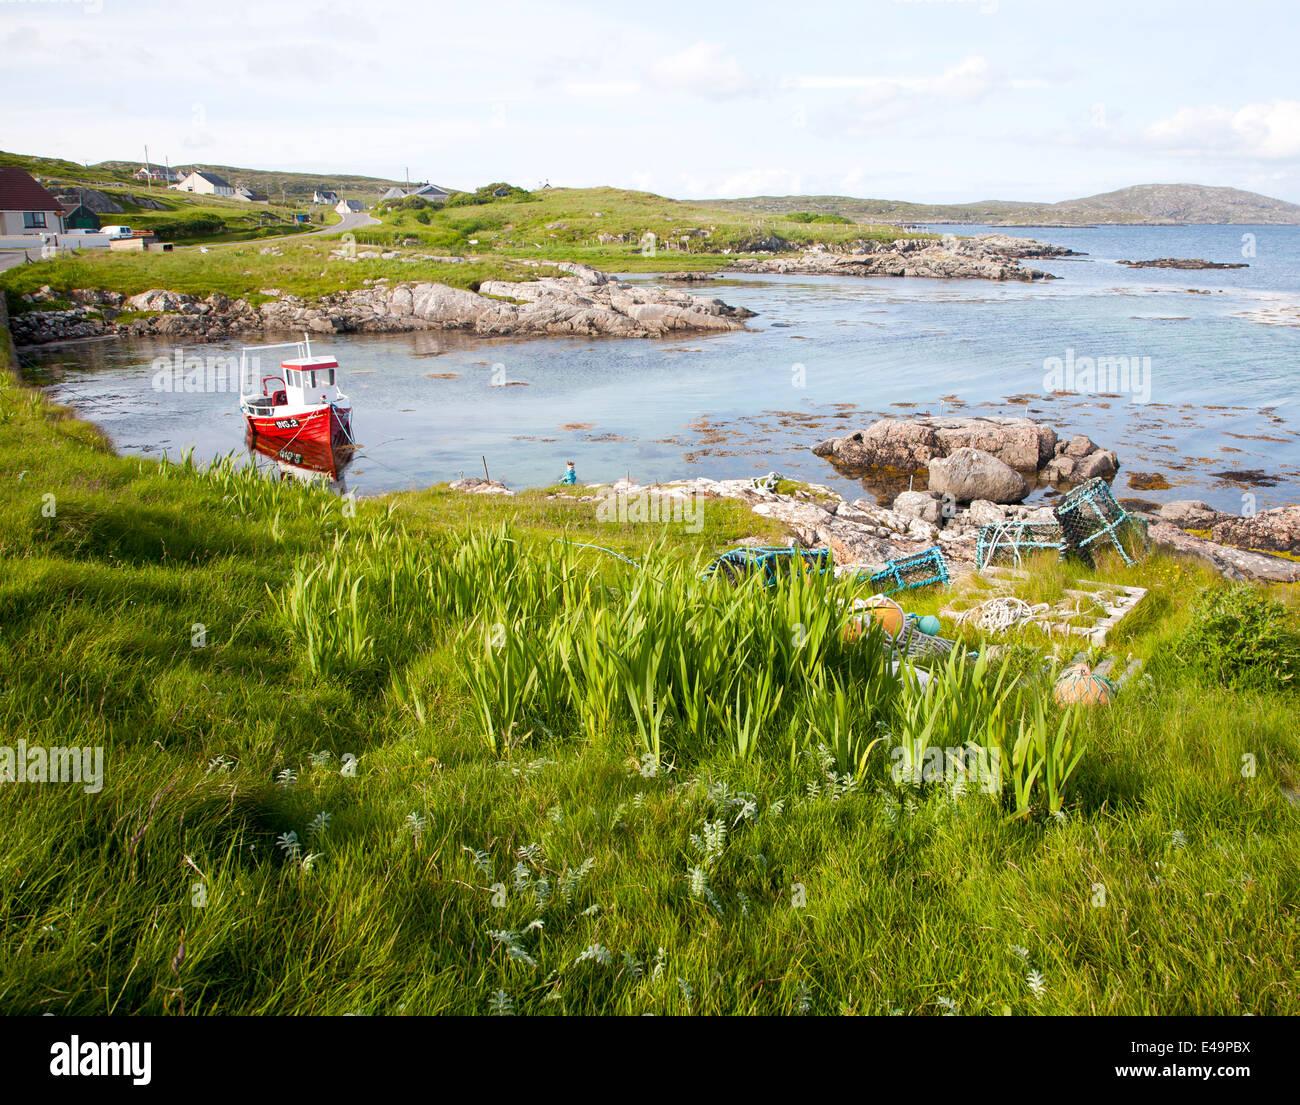 Fishing boat Isle of Barra, Outer Hebrides, Scotland - Stock Image